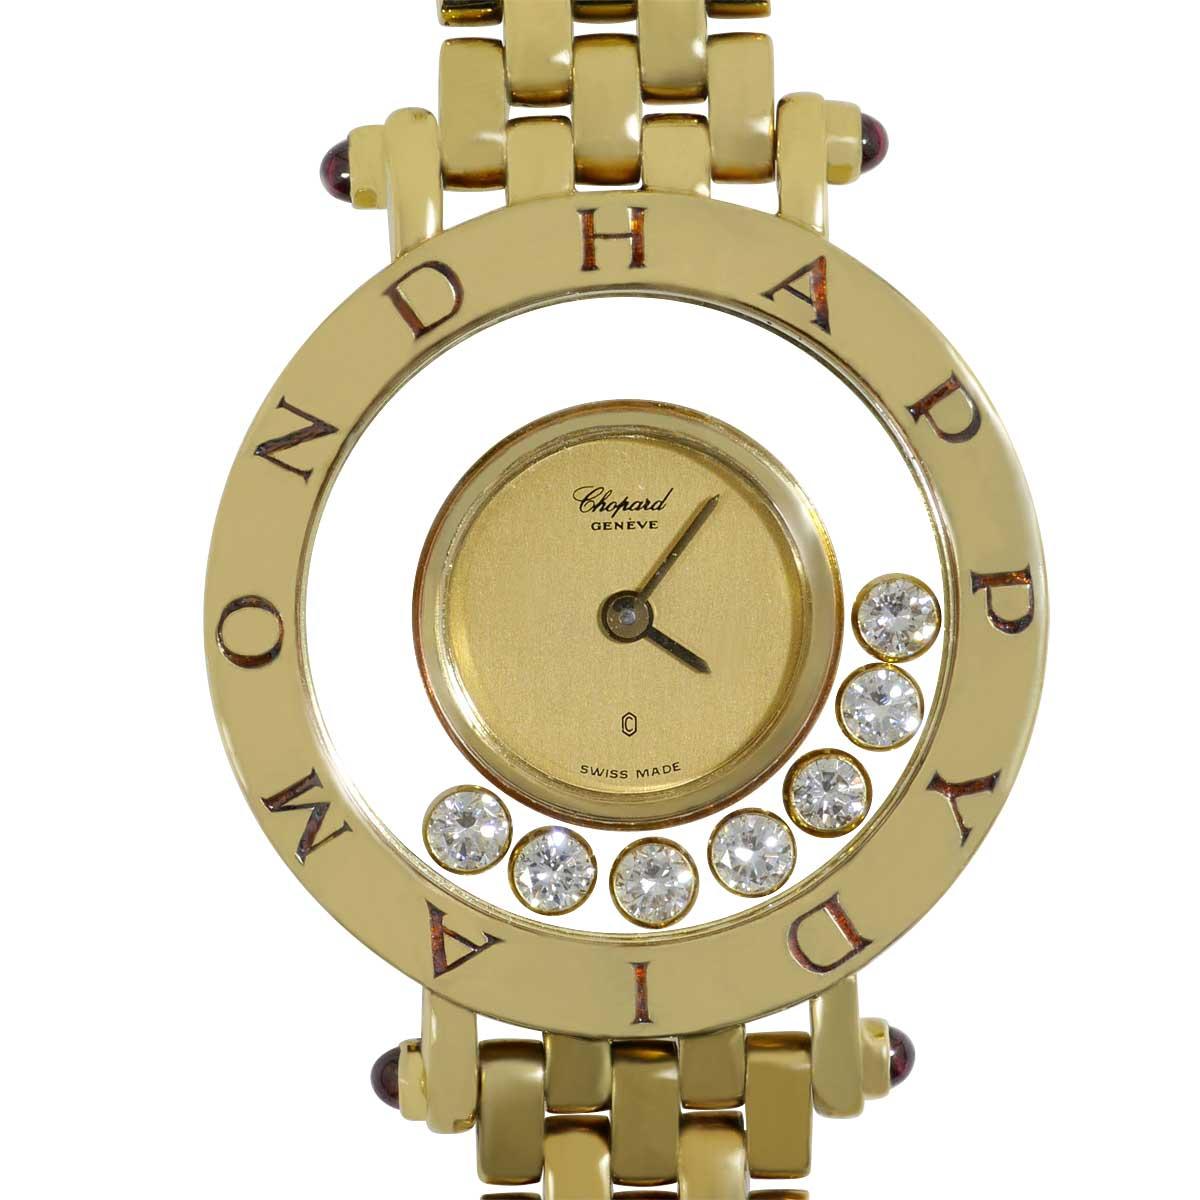 tissot schweizer damen armbanduhr 585 gelbgold schmuck. Black Bedroom Furniture Sets. Home Design Ideas